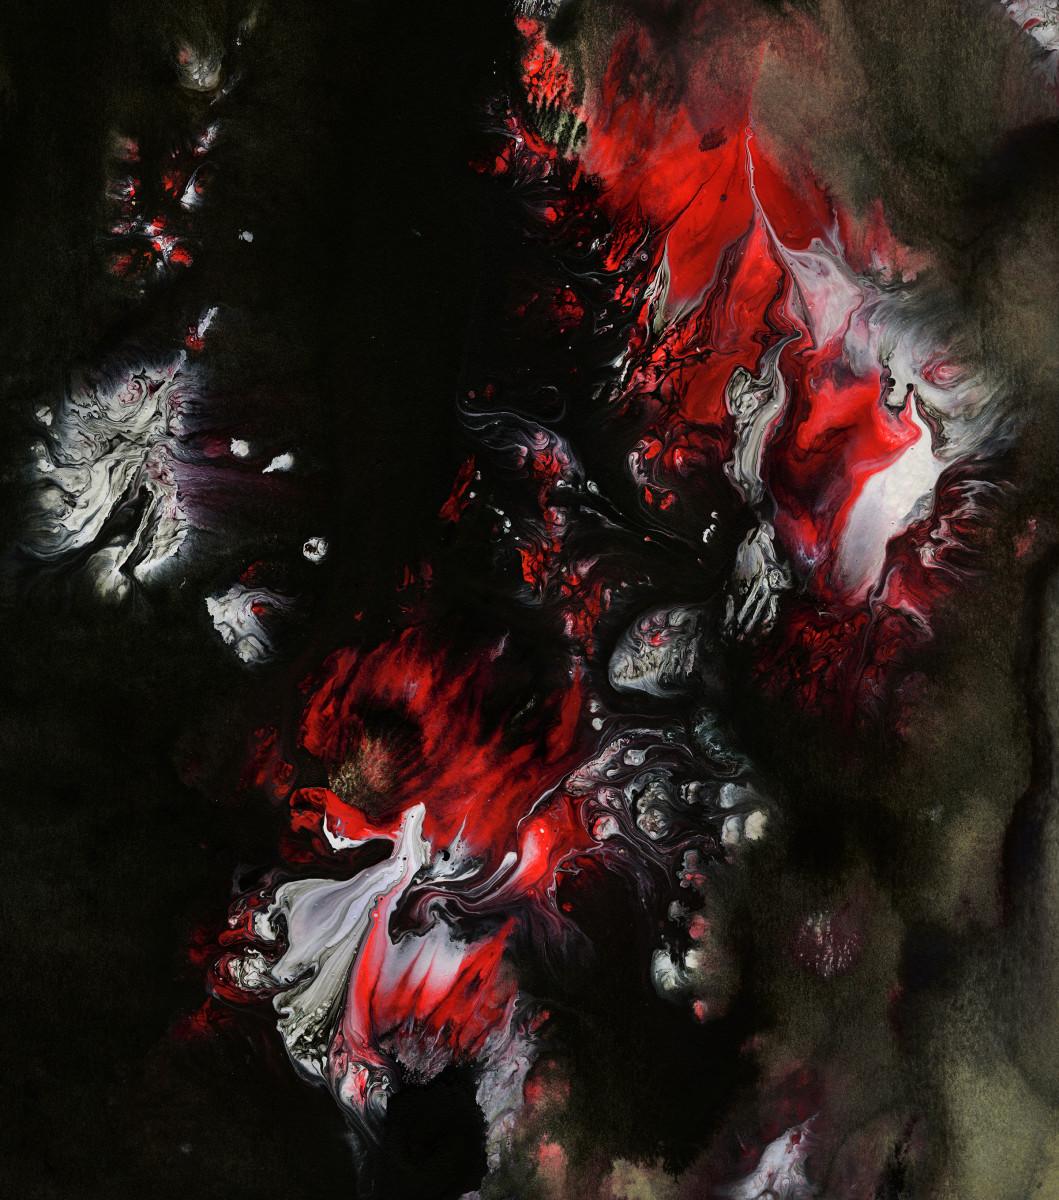 BLAZING FIRES #6 by Hannah Thomas